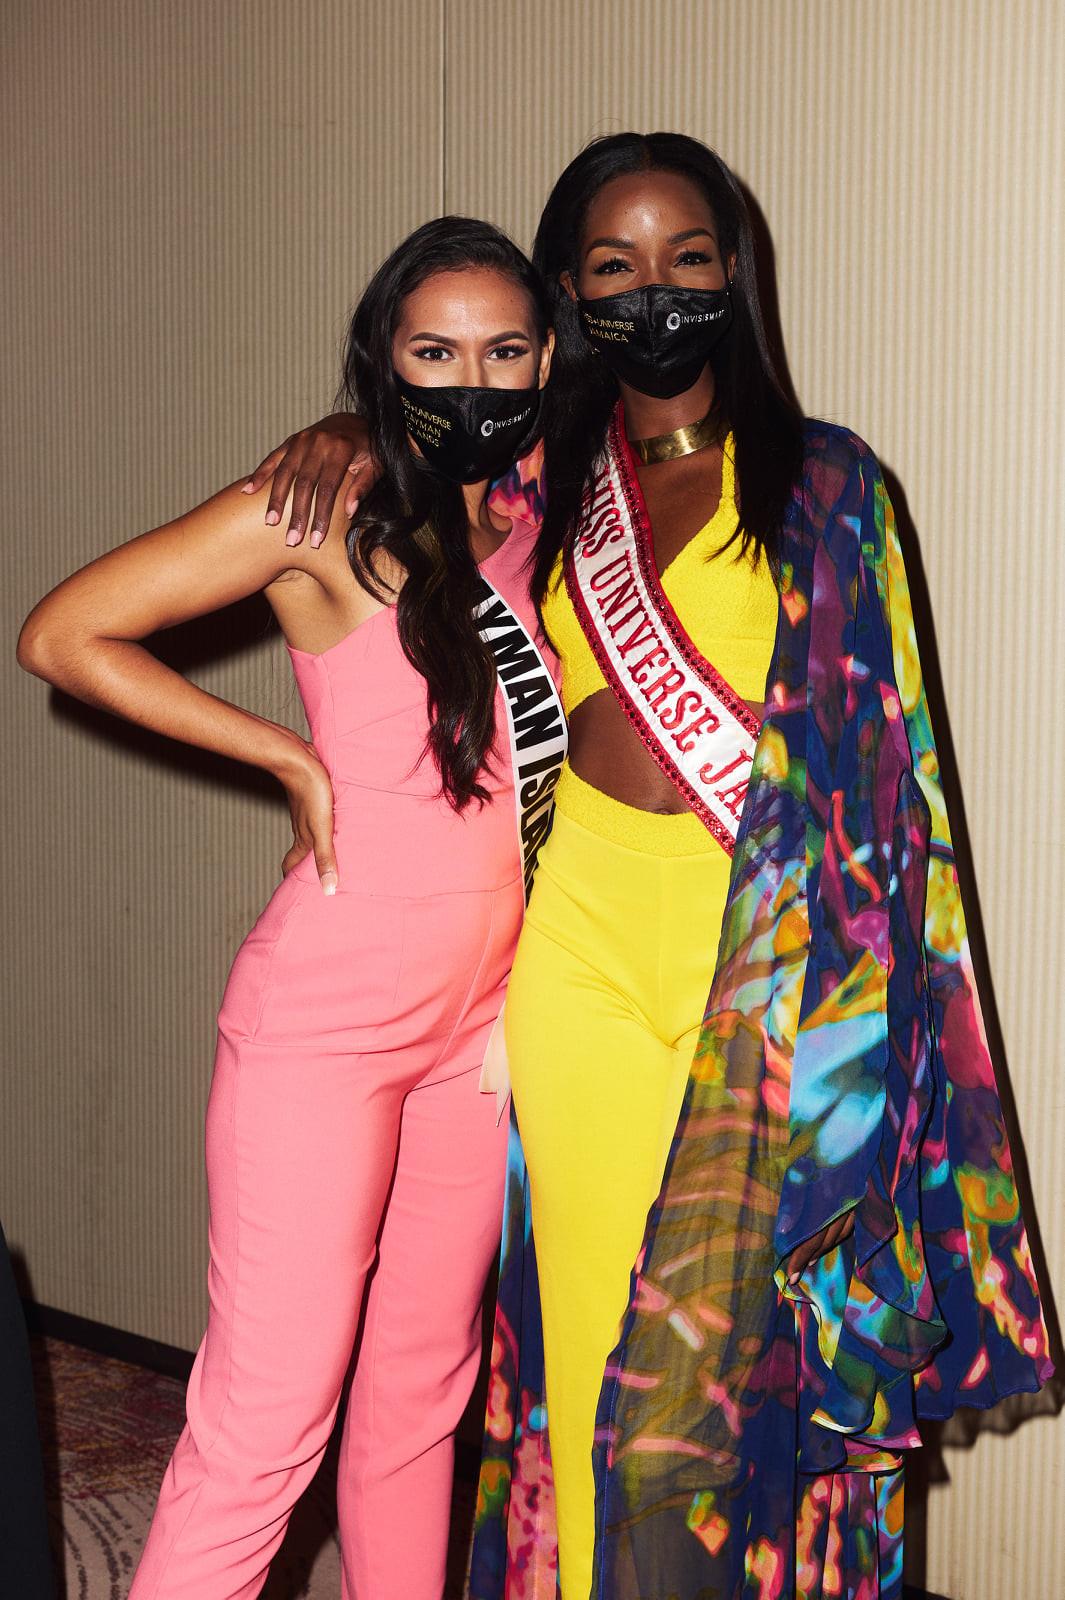 miqueal-symone williams, top 10 de miss universe 2020. - Página 6 Babeas10